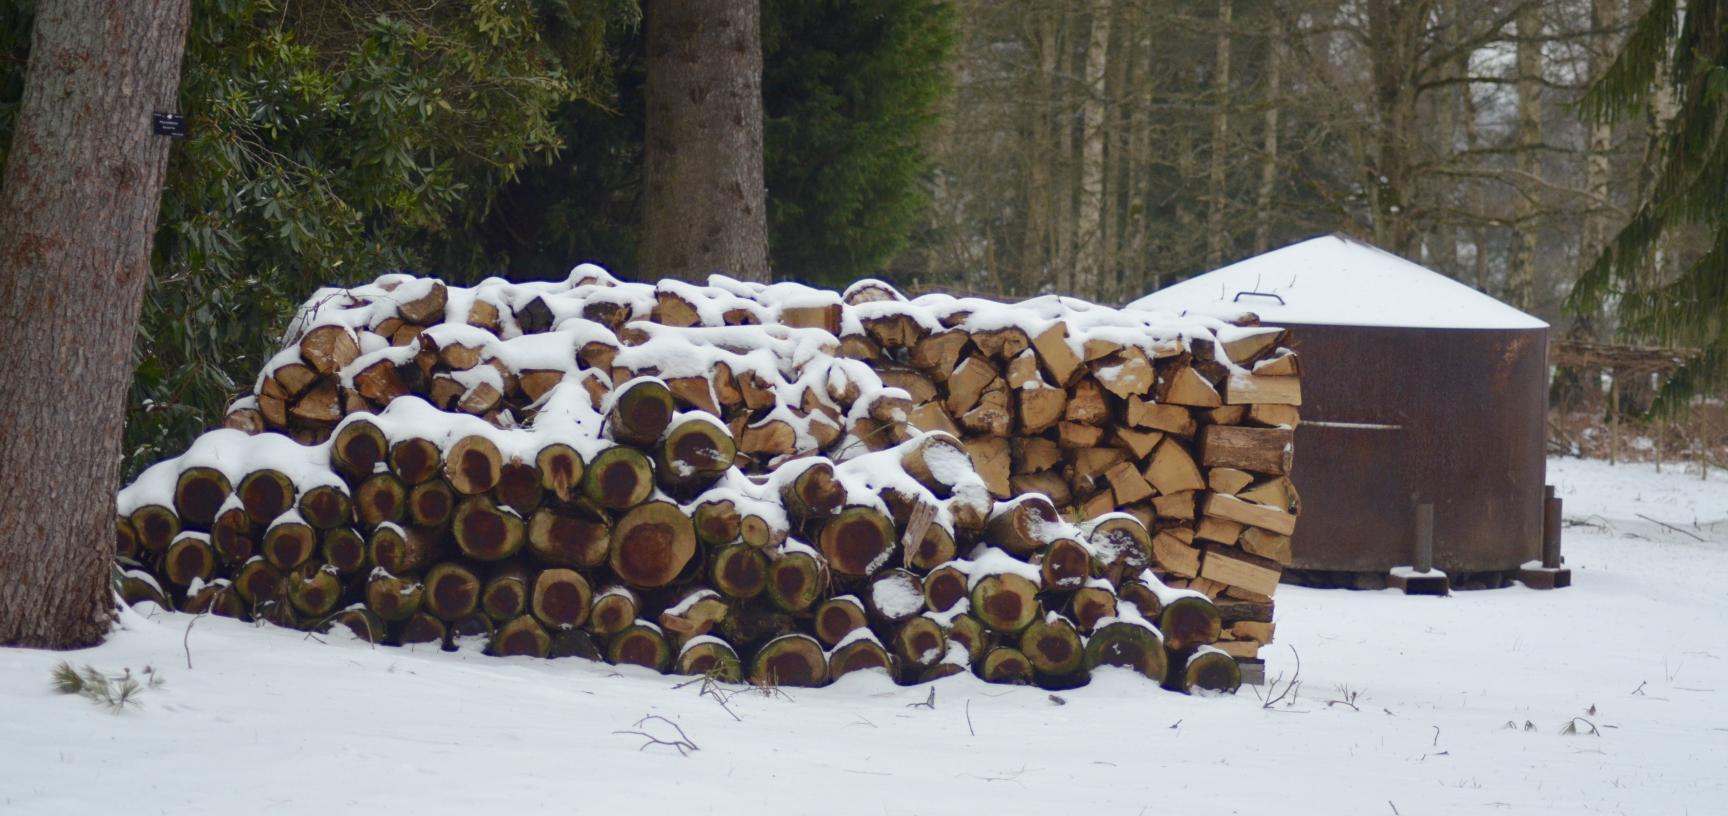 Winter Snow Charcoal Burner Arboretum